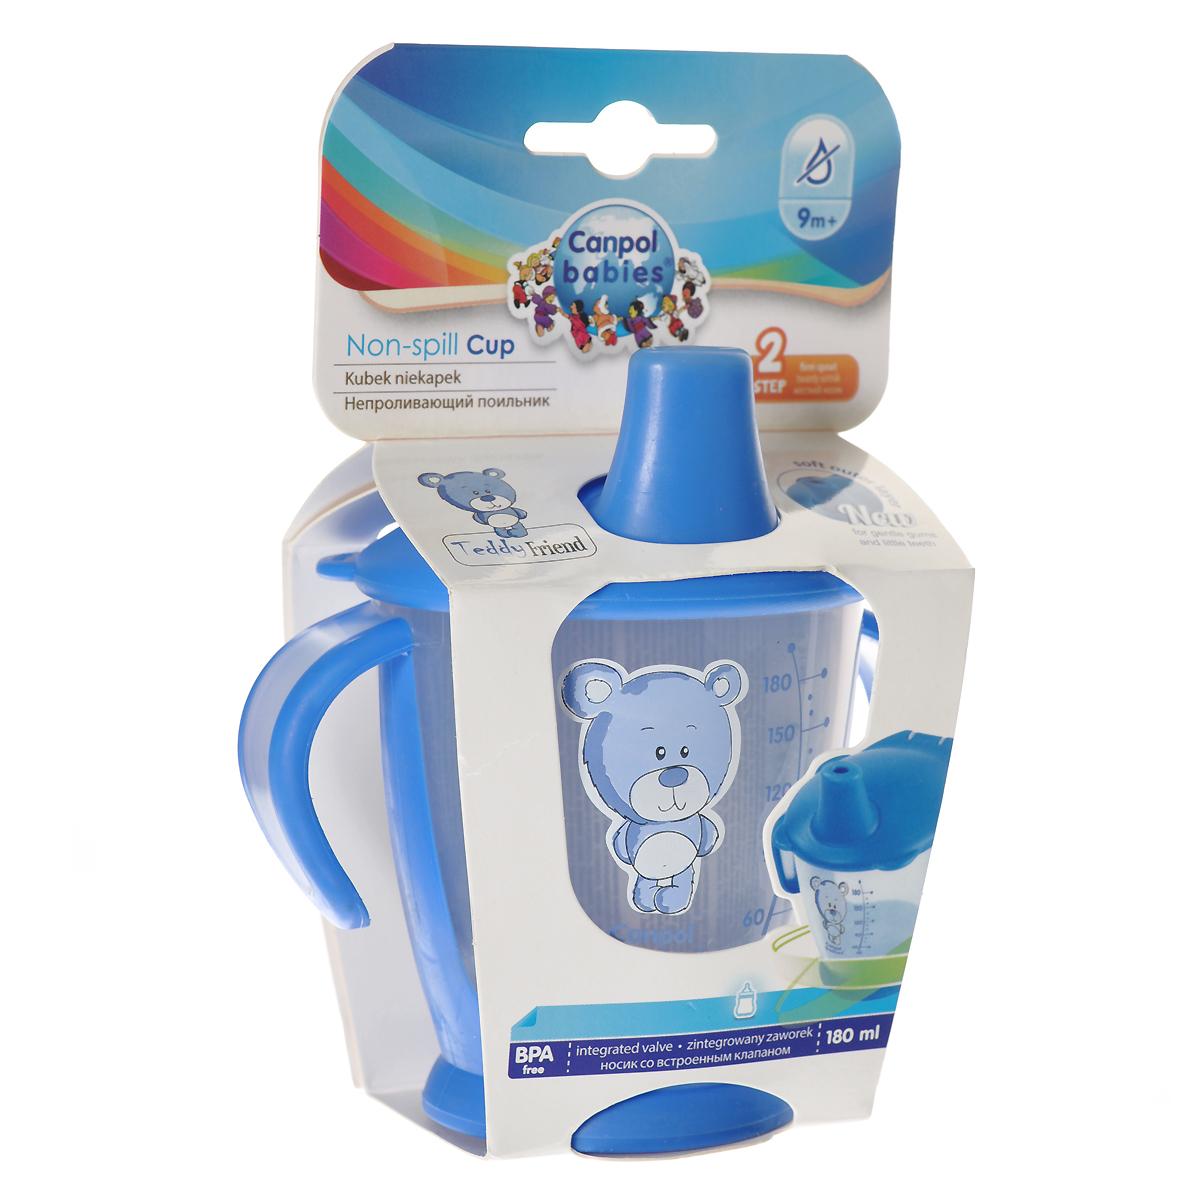 Canpol Babies Поильник Медвежонок непроливающий цвет синий 180 мл